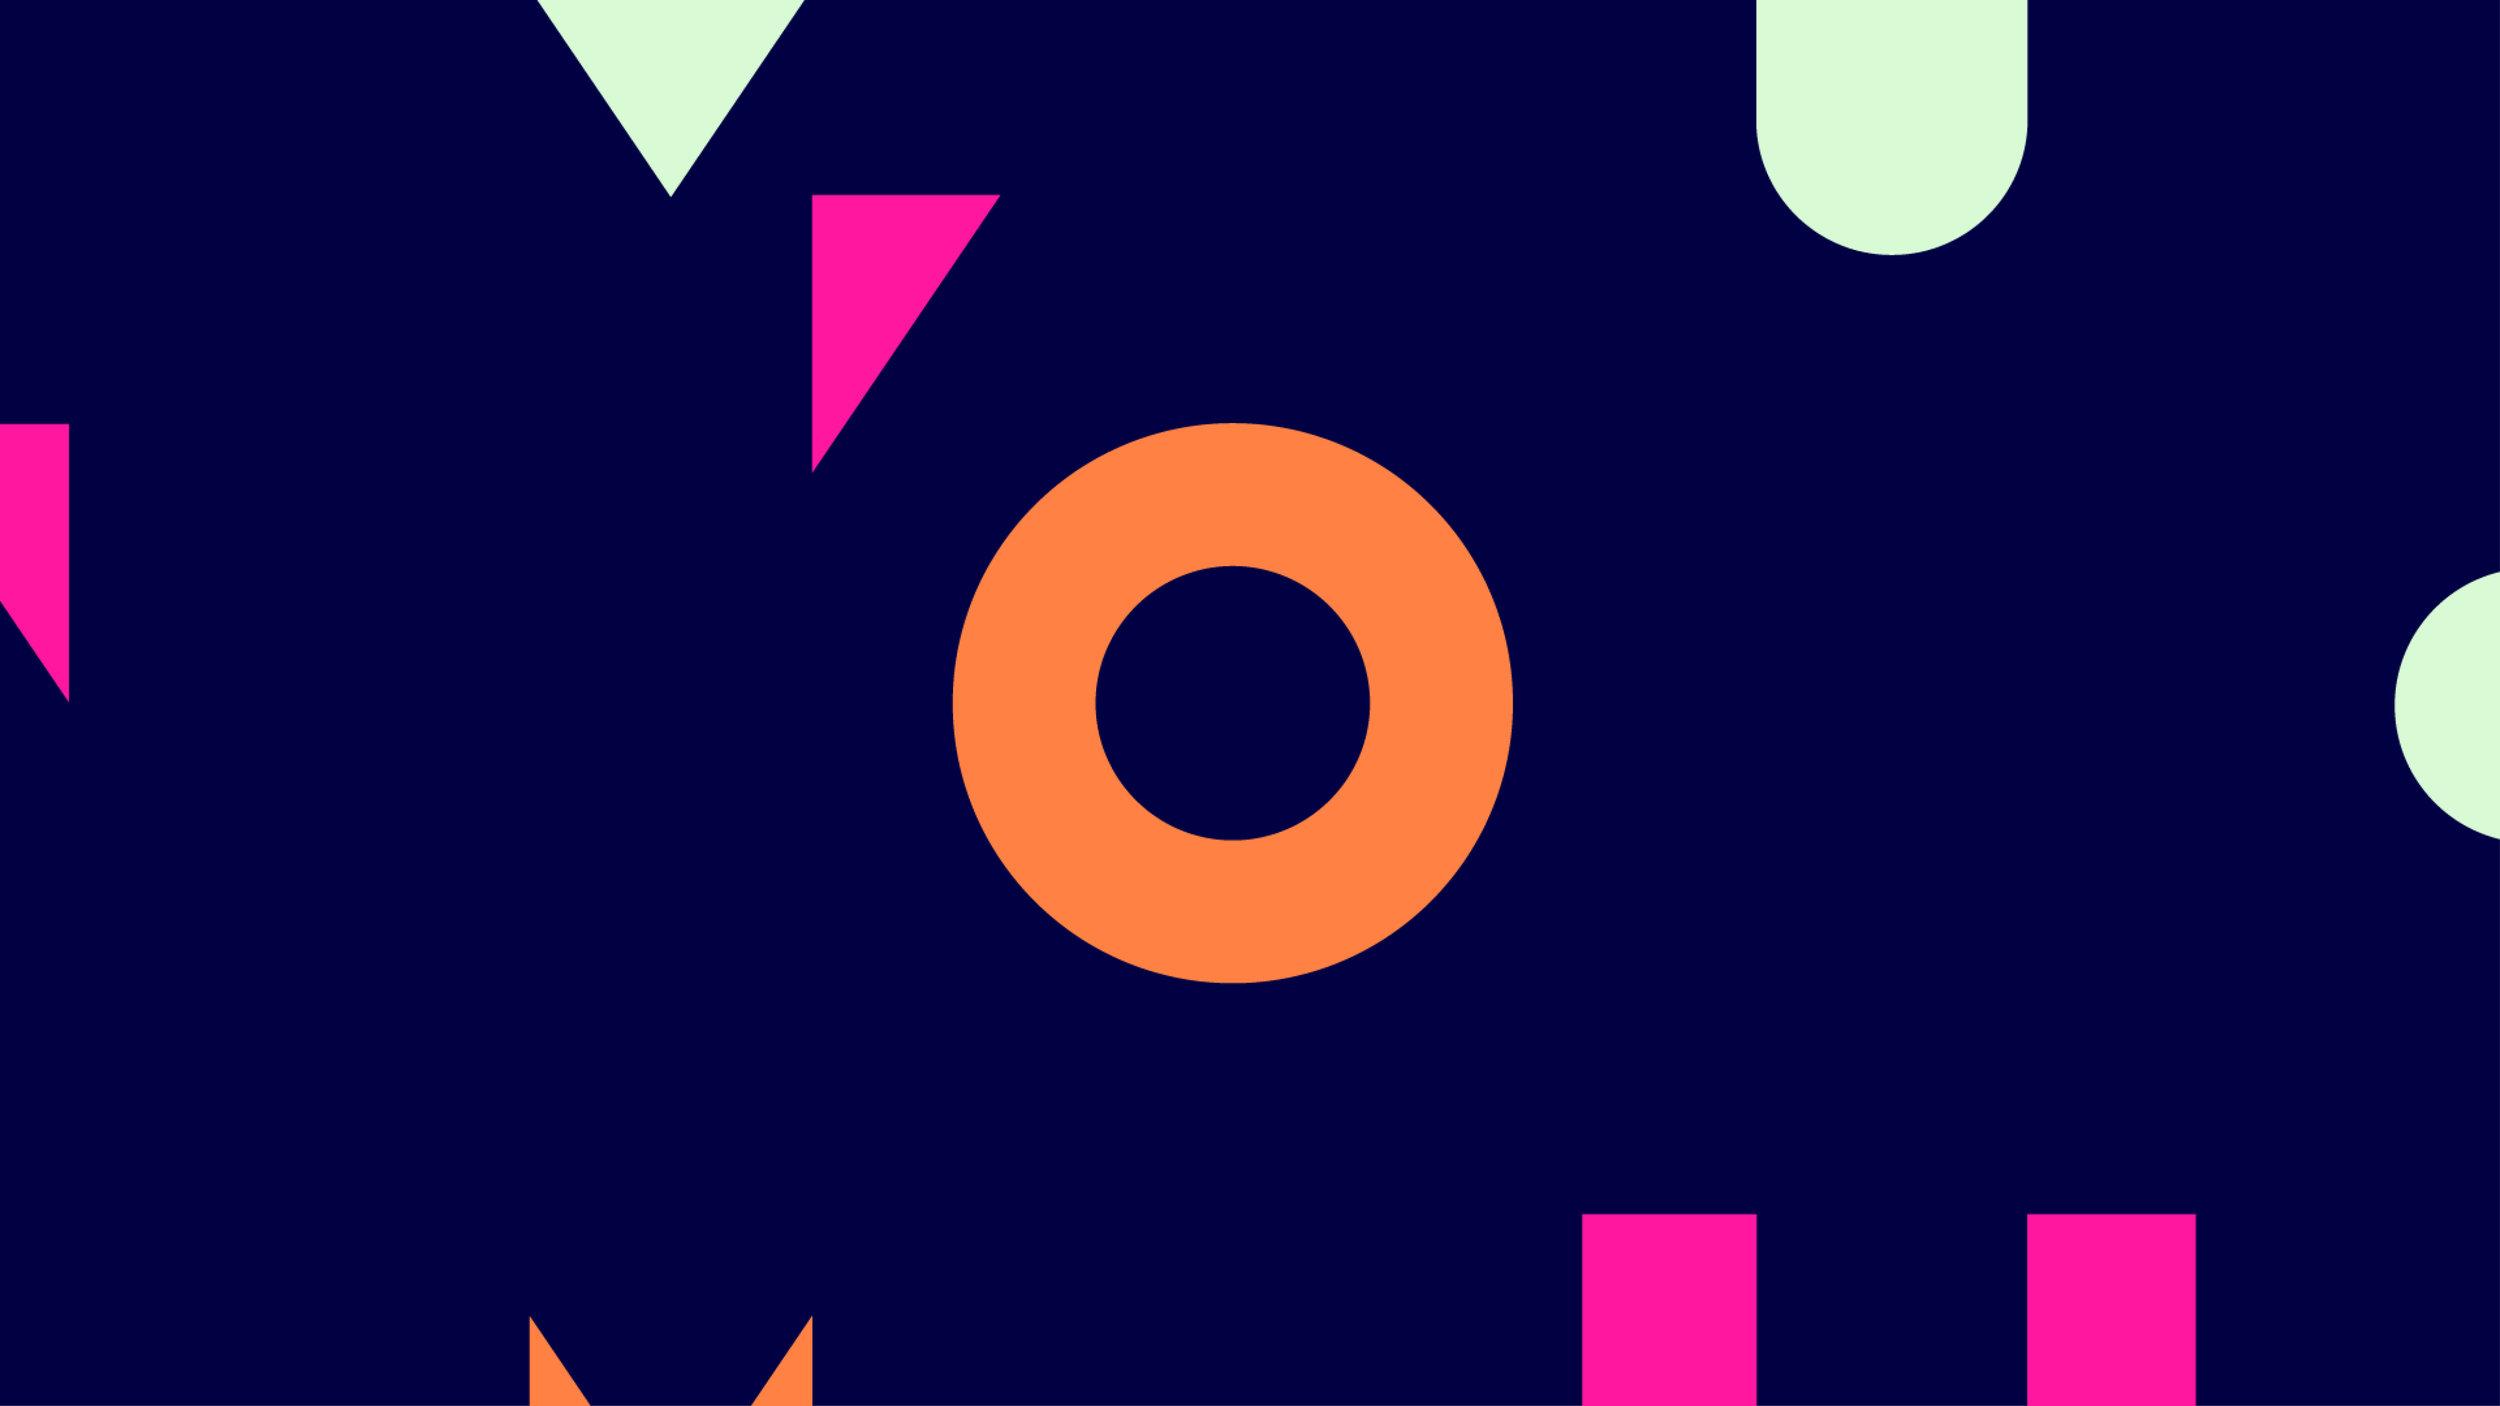 0314-01-211 CO Vodafone YOU Identity 42.jpg